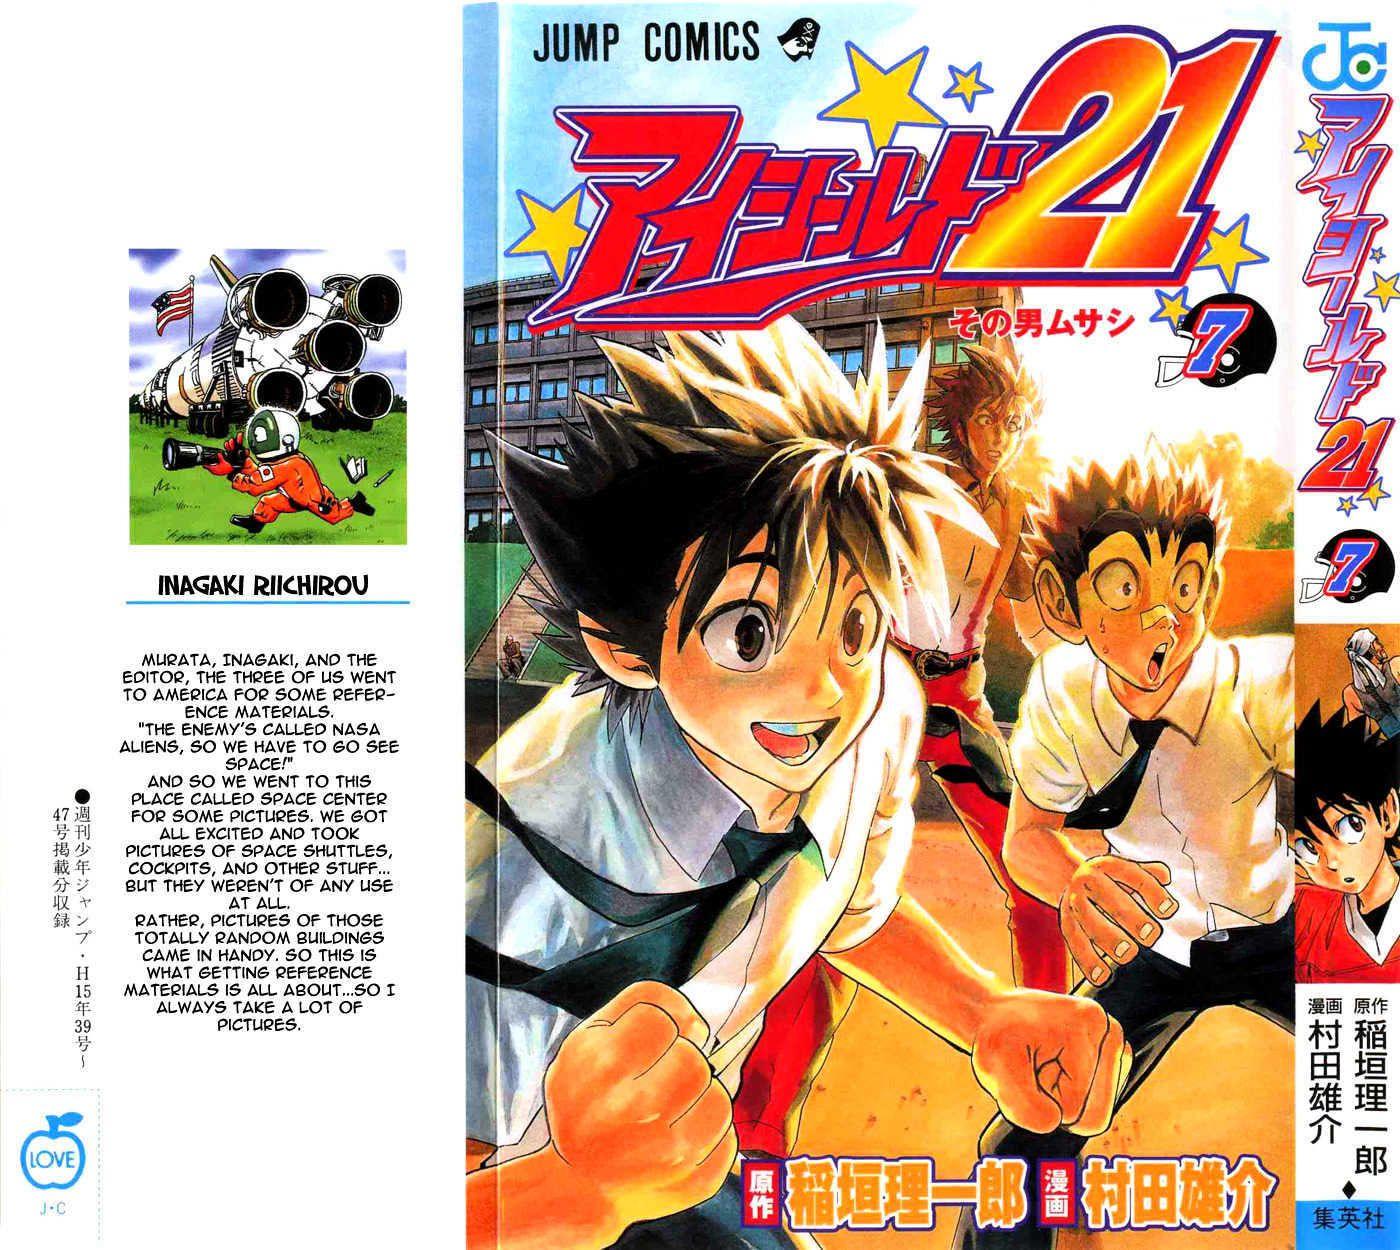 Manga Online Eyeshield 21: (Eyeshield 21 53) The Lighting!